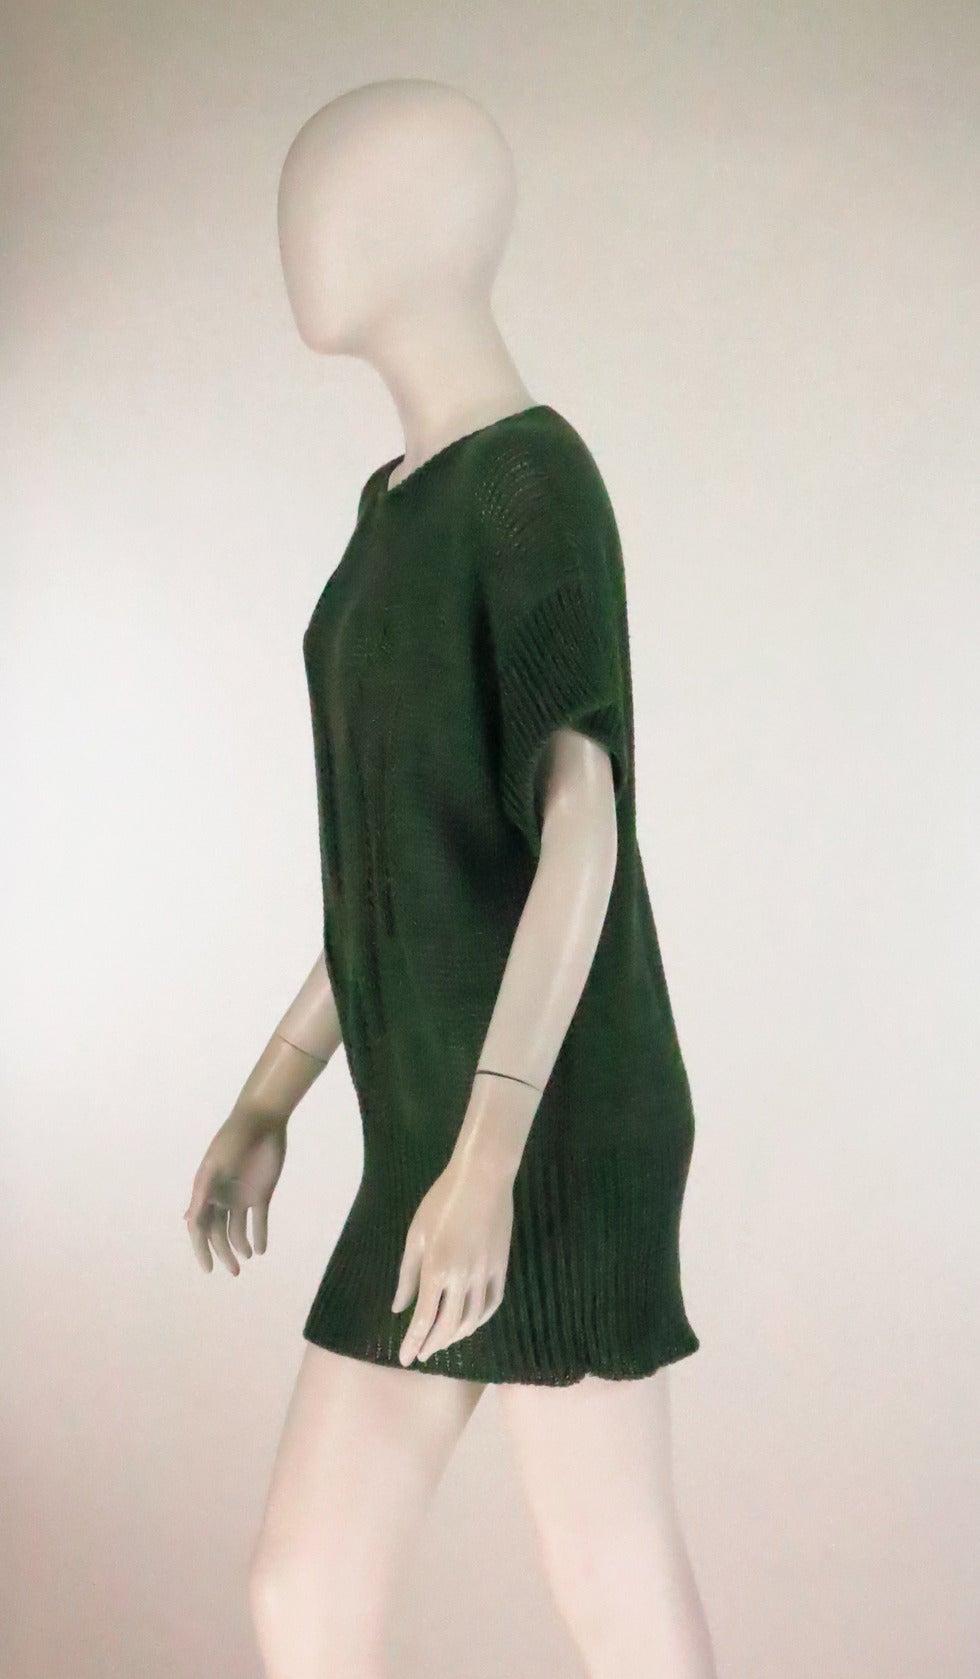 1980s Jil Sander pine green sweater knit tunic 2